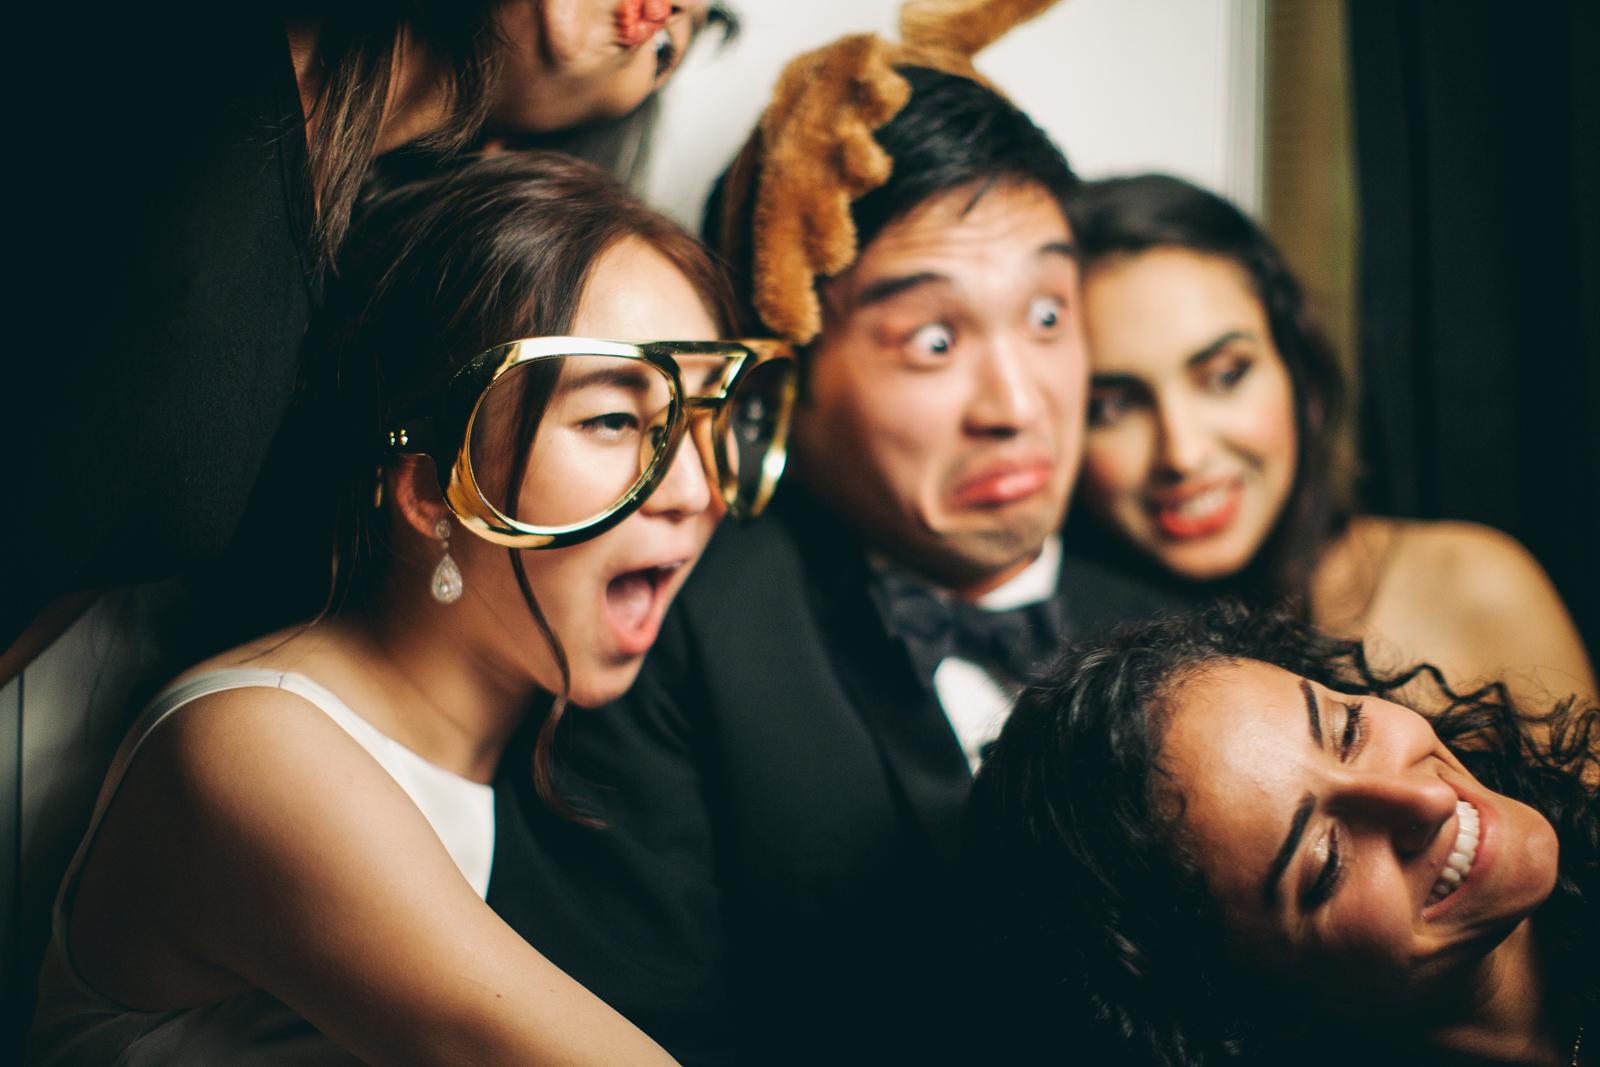 kohl_manison_wedding_photography_sarah_eric_ebony_siovhan_bokeh_photography_103.jpg